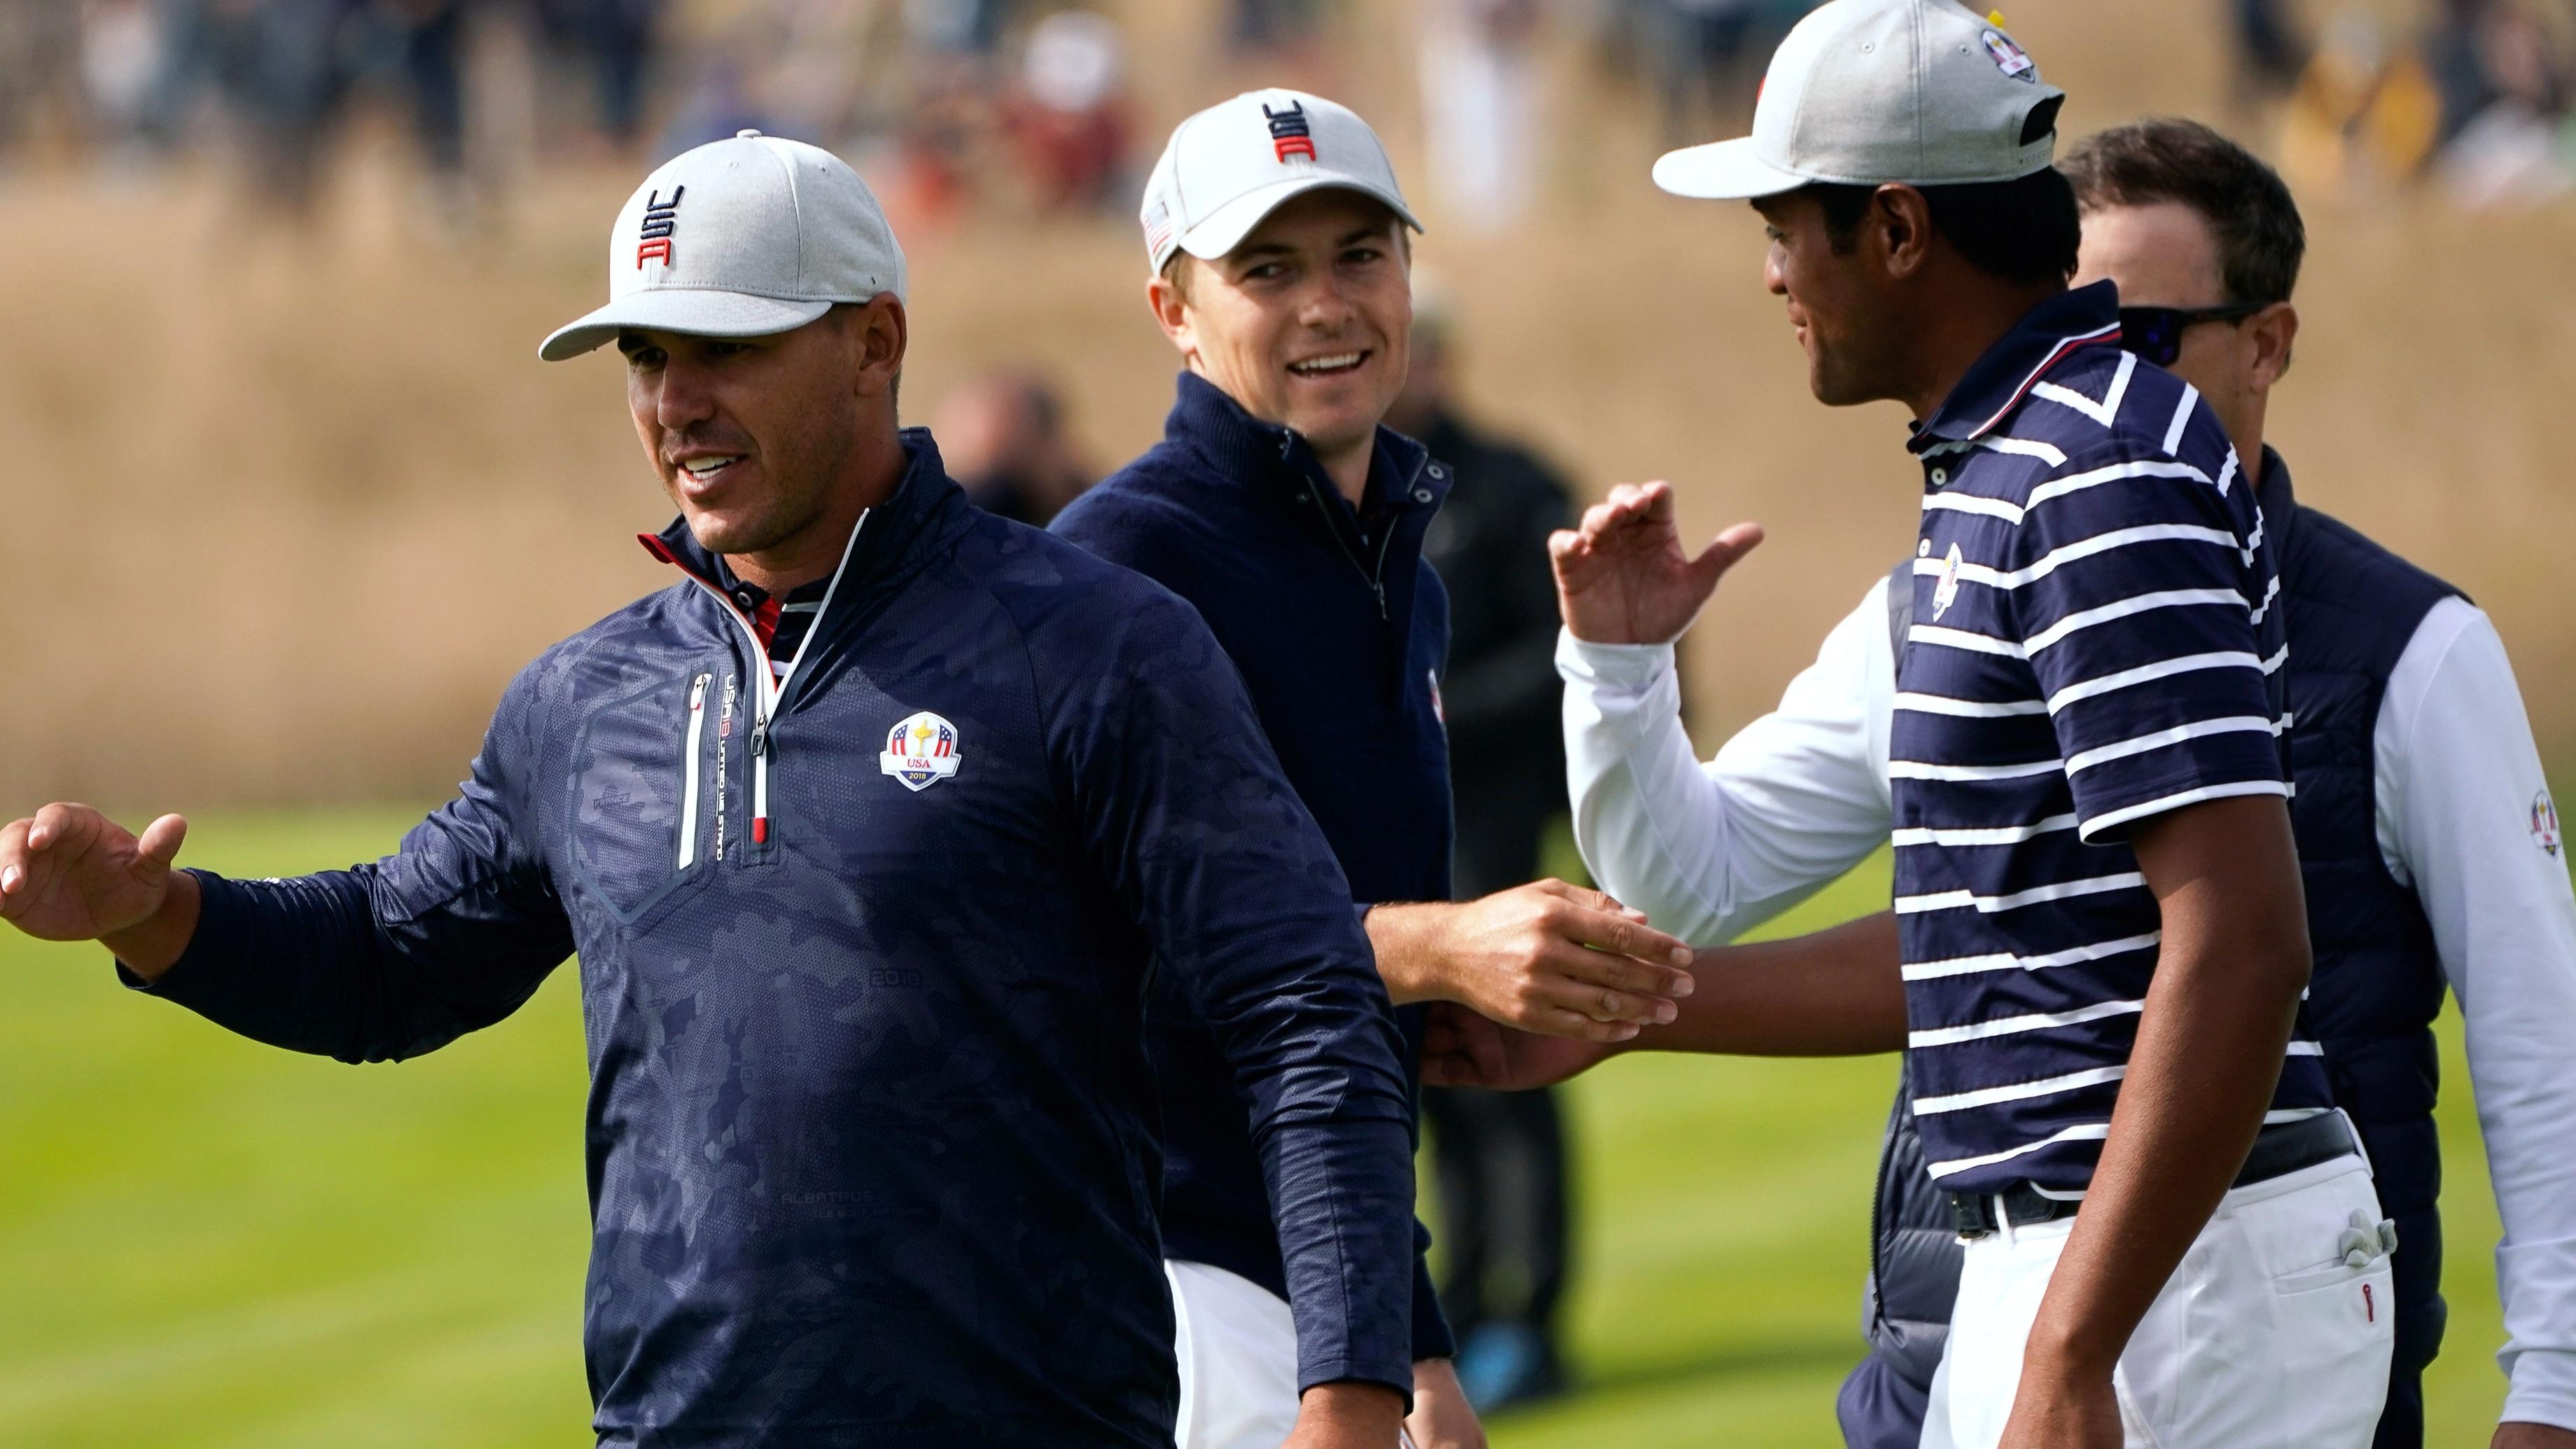 Le Golf National Ryder Cup 18th hole Justin THomas Jordan Spieth